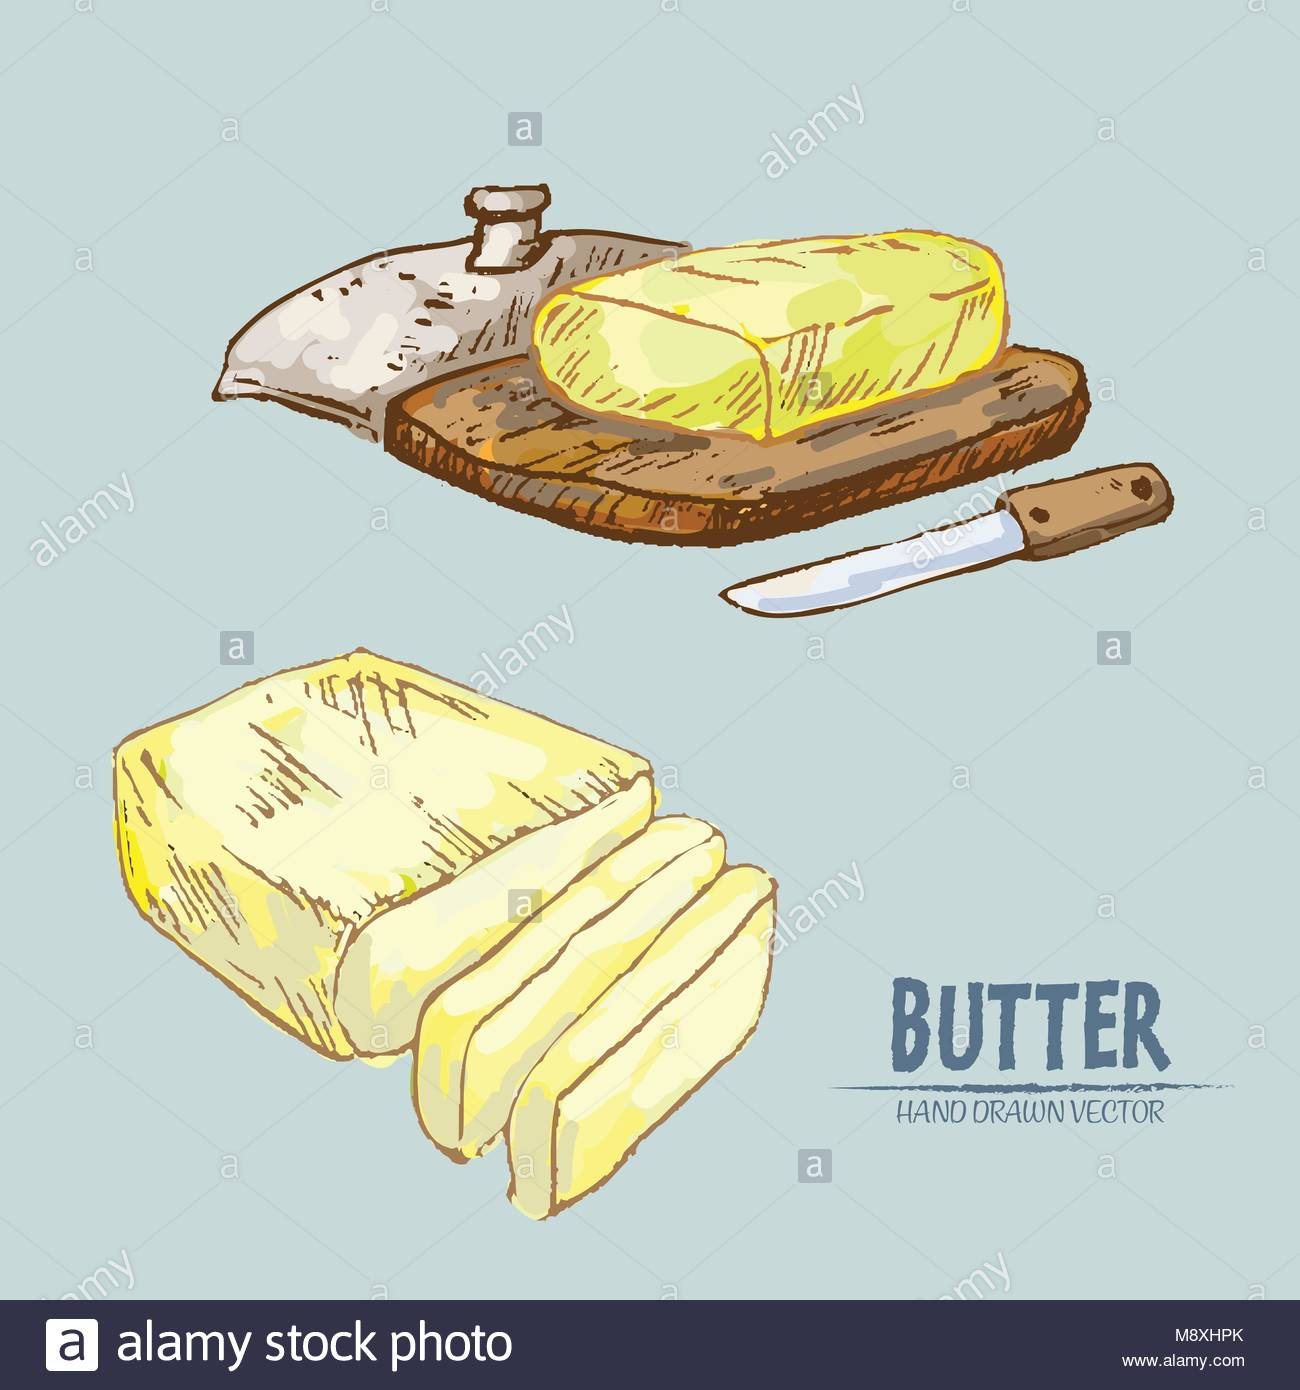 Food Illustration Retro Clip Art Butter Stock Photos & Food.